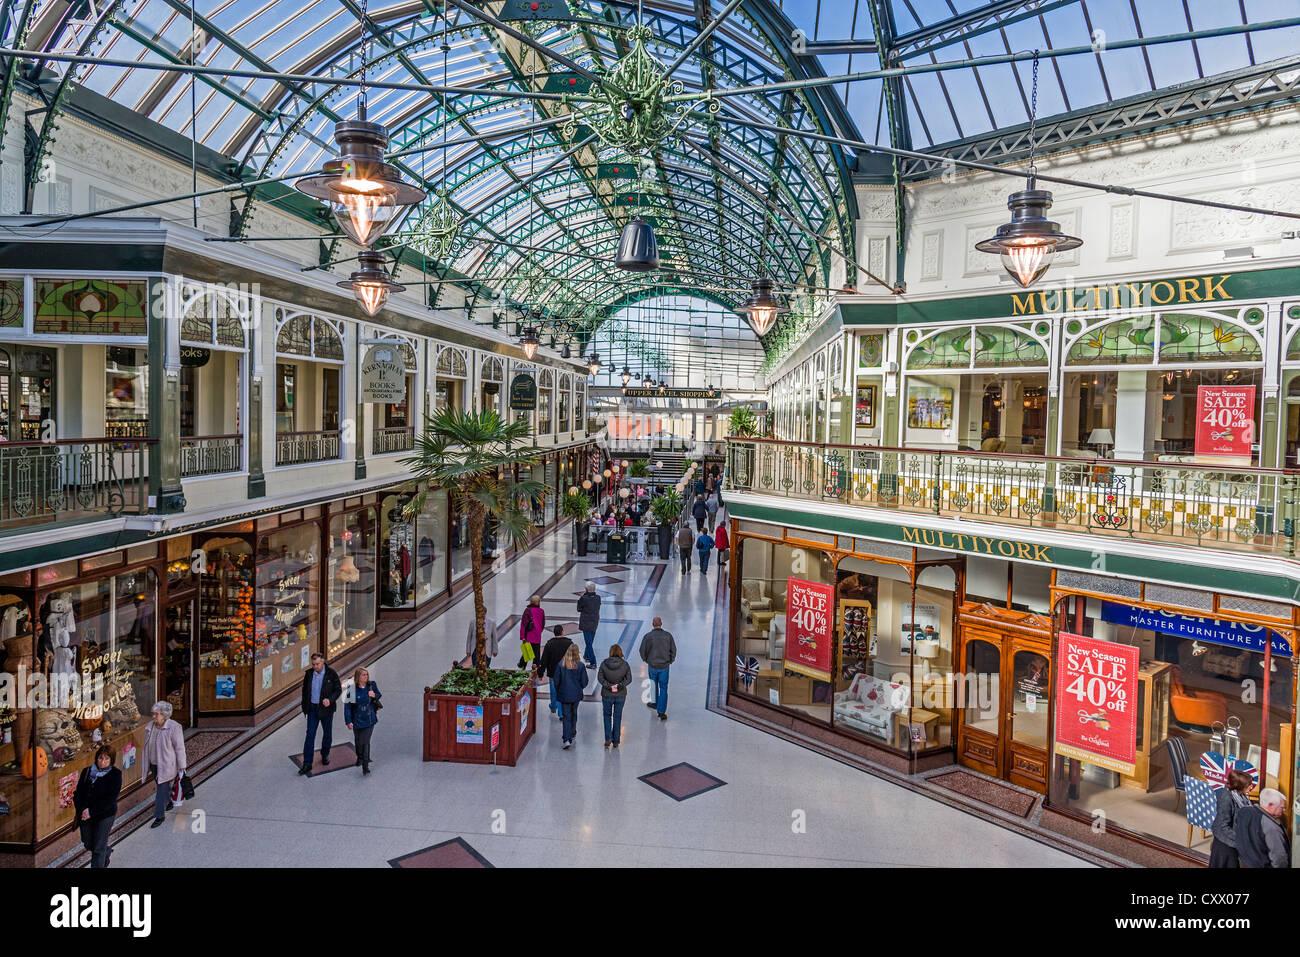 The Wayfarers Arcade in Lord Street, Southport Merseyside. Stock Photo